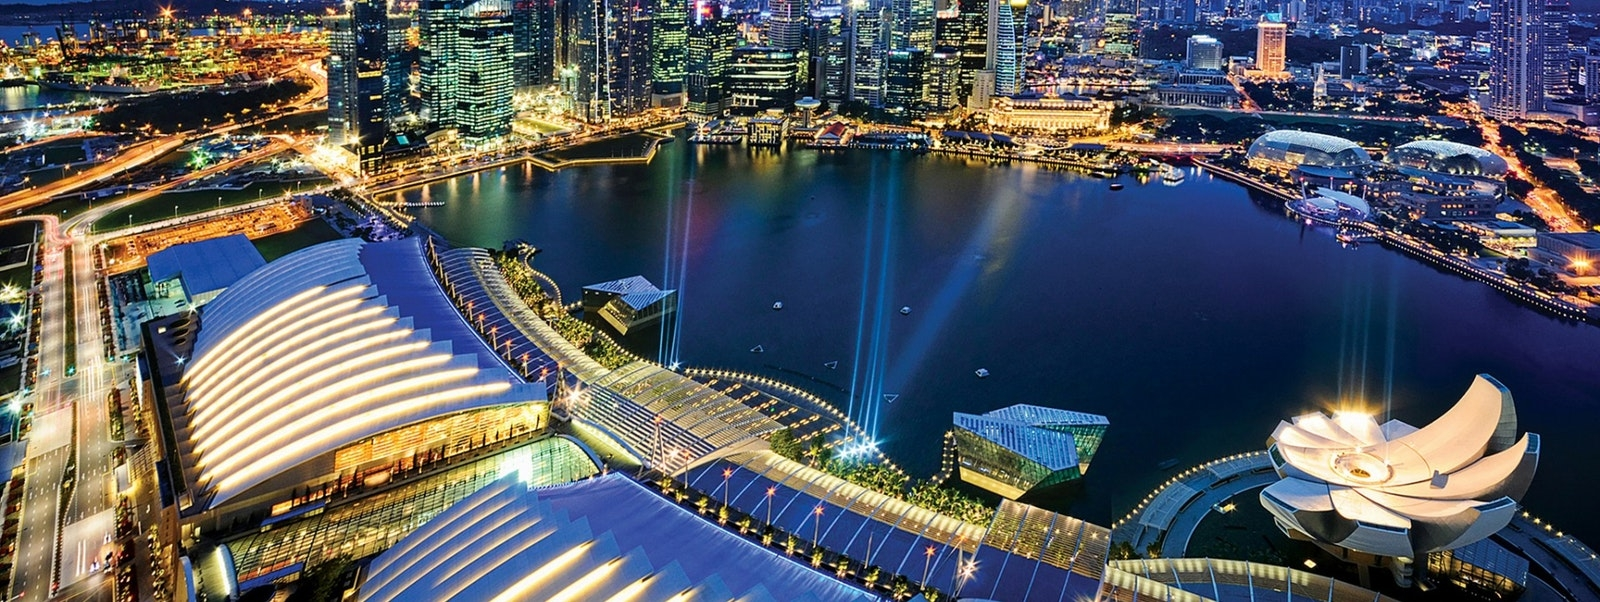 Singapore Case Competition